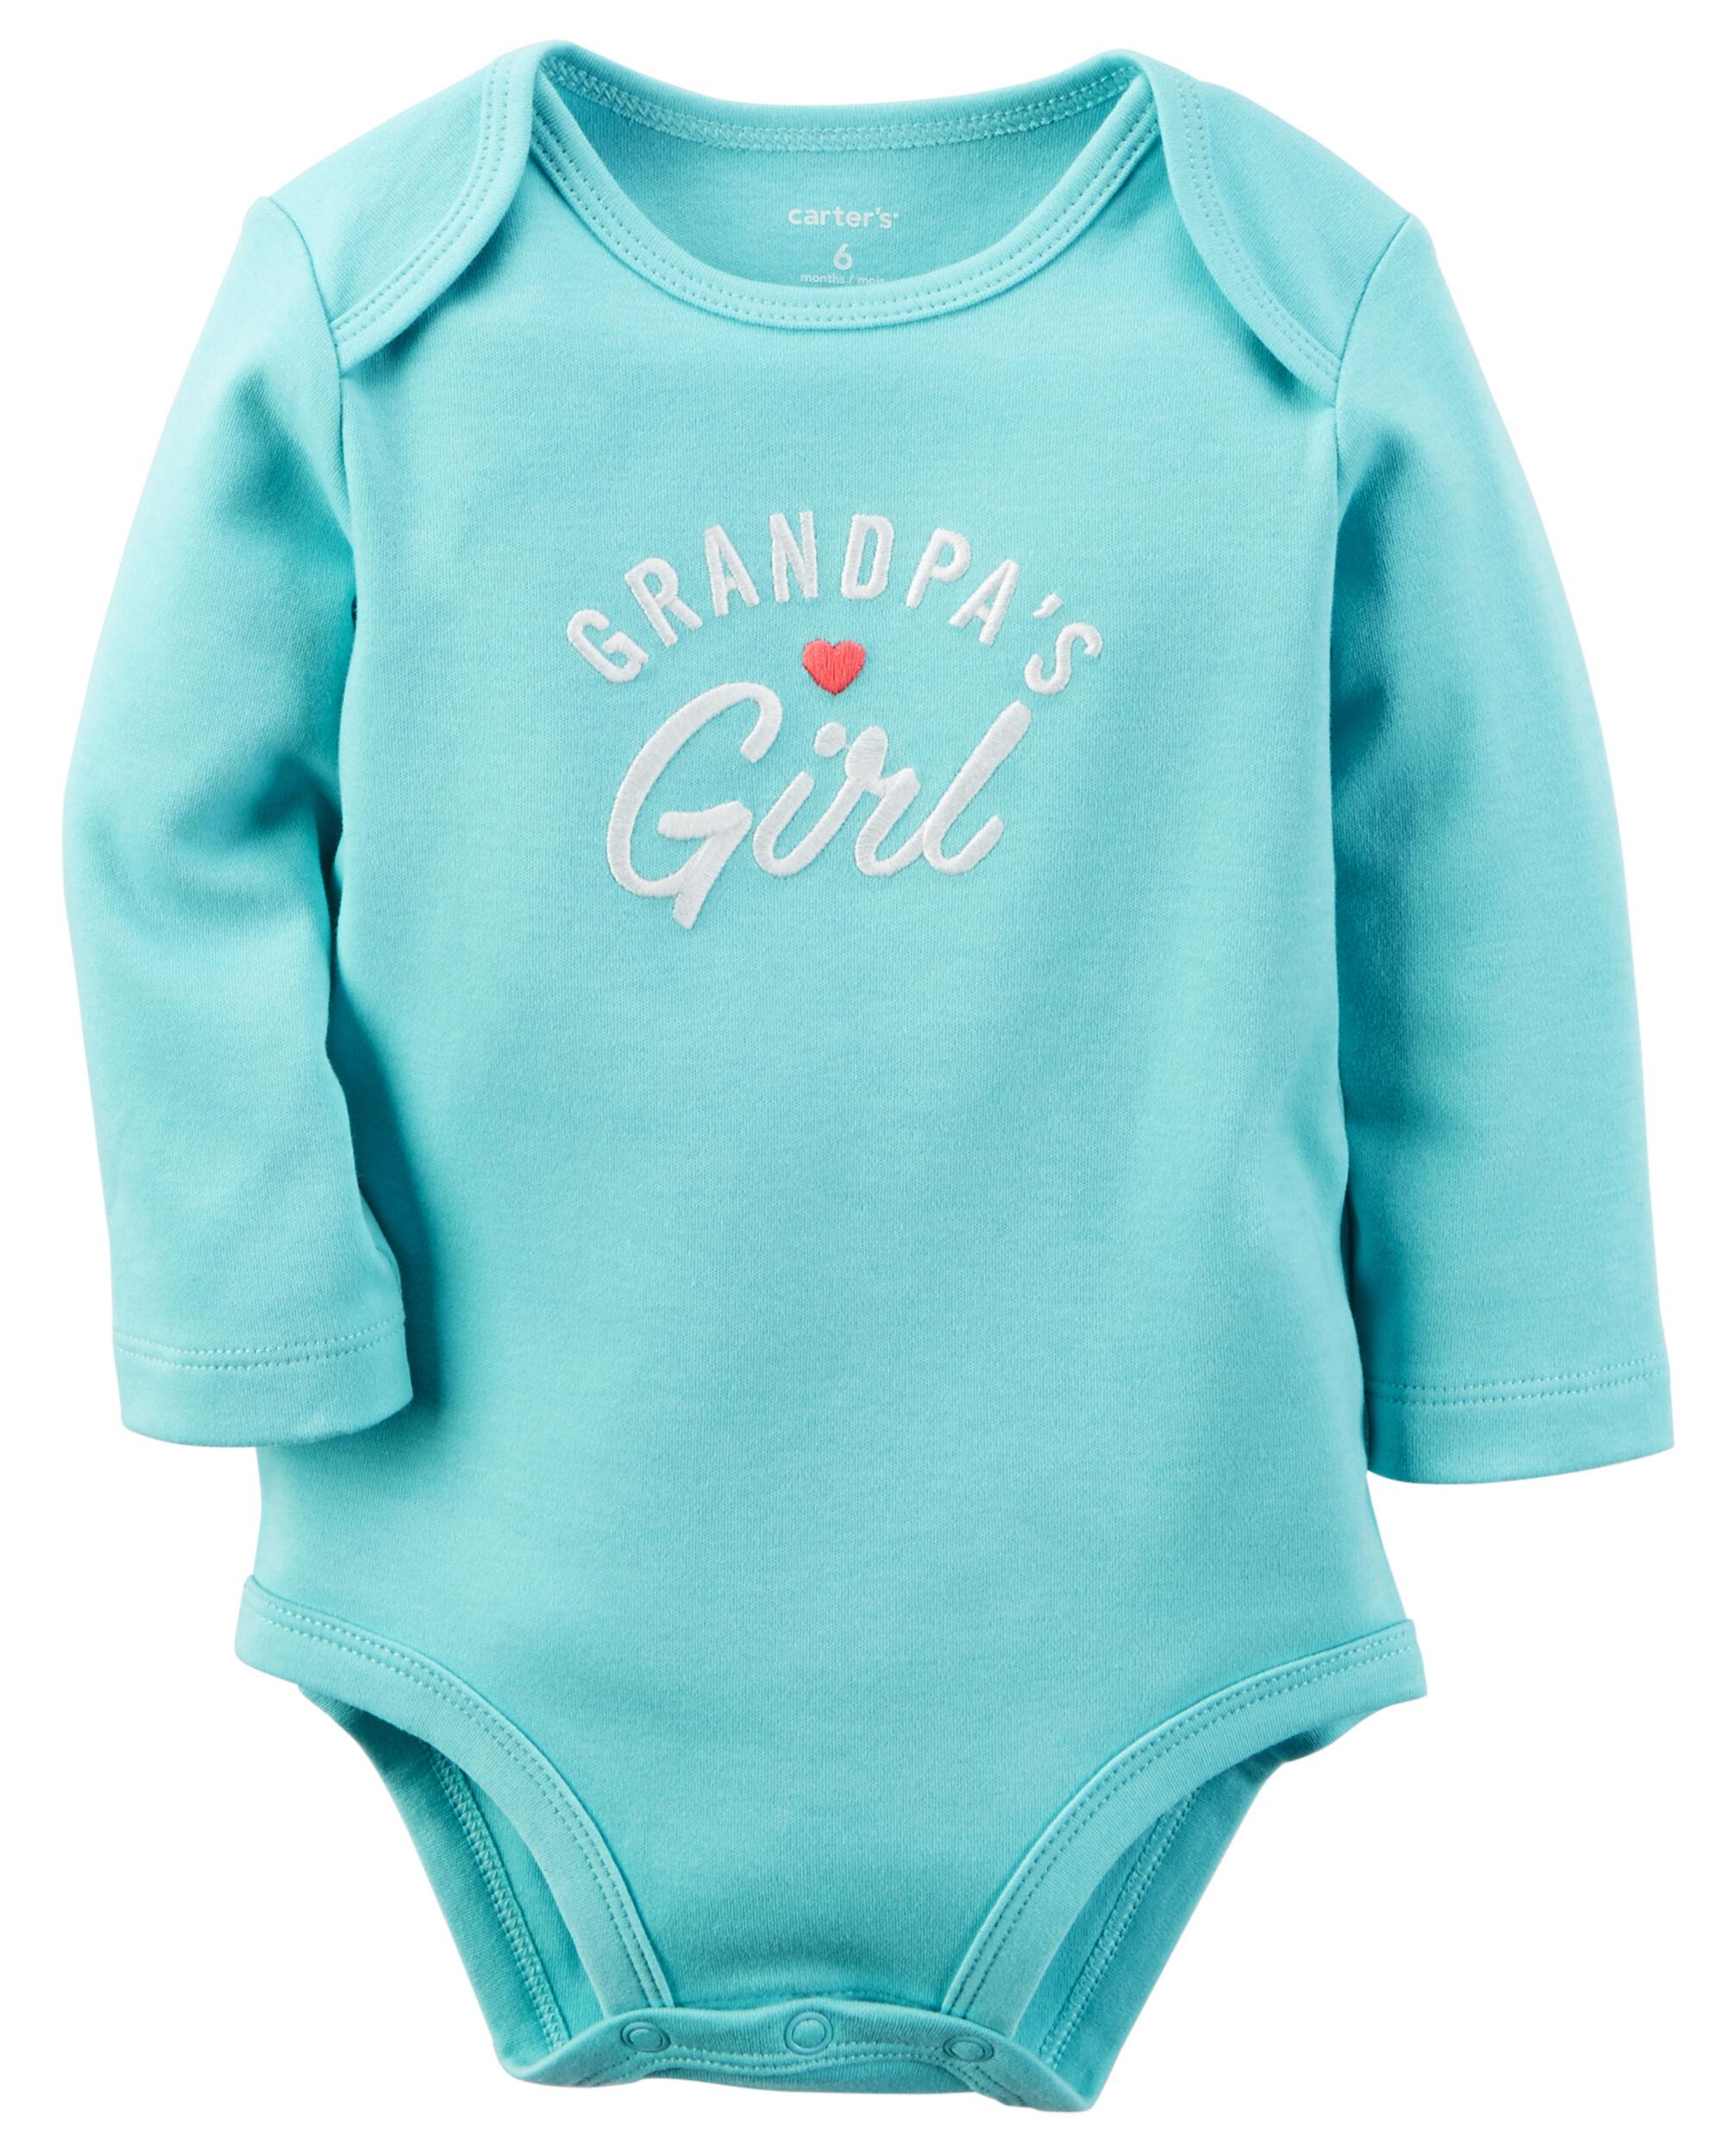 Grandpa s Girl Collectible Bodysuit